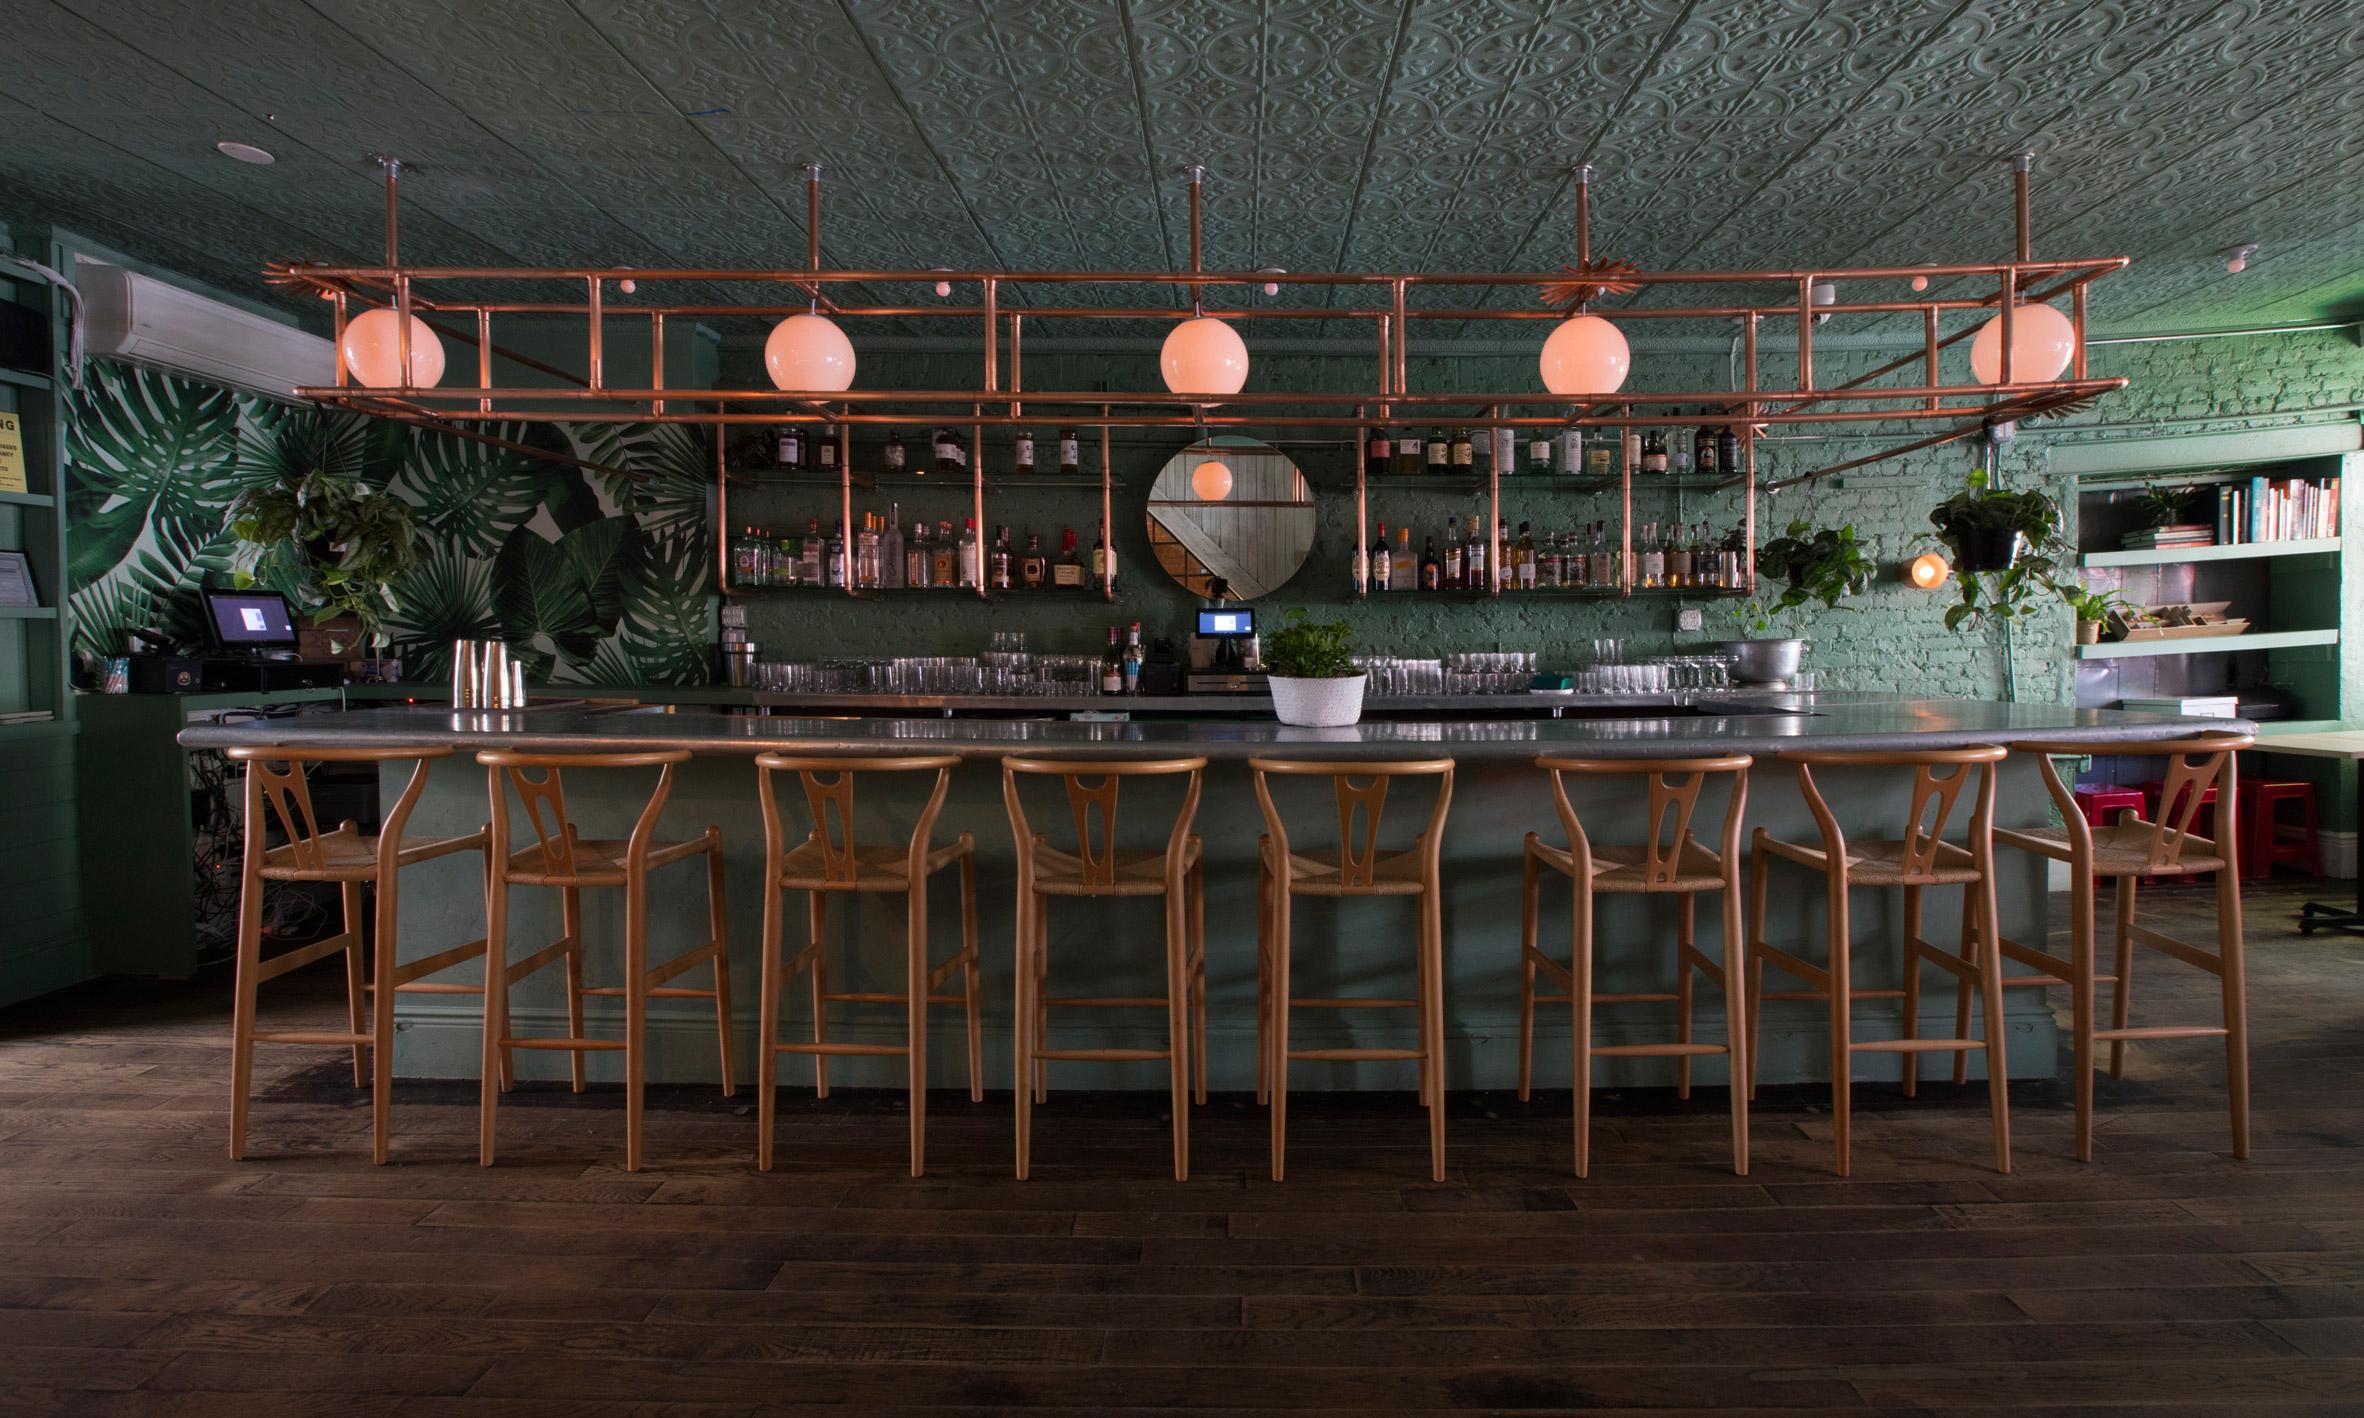 di-an-di-huy-bui-interiors-restaurant-brooklyn-new-york-usa_dezeen_2364_col_4.jpg